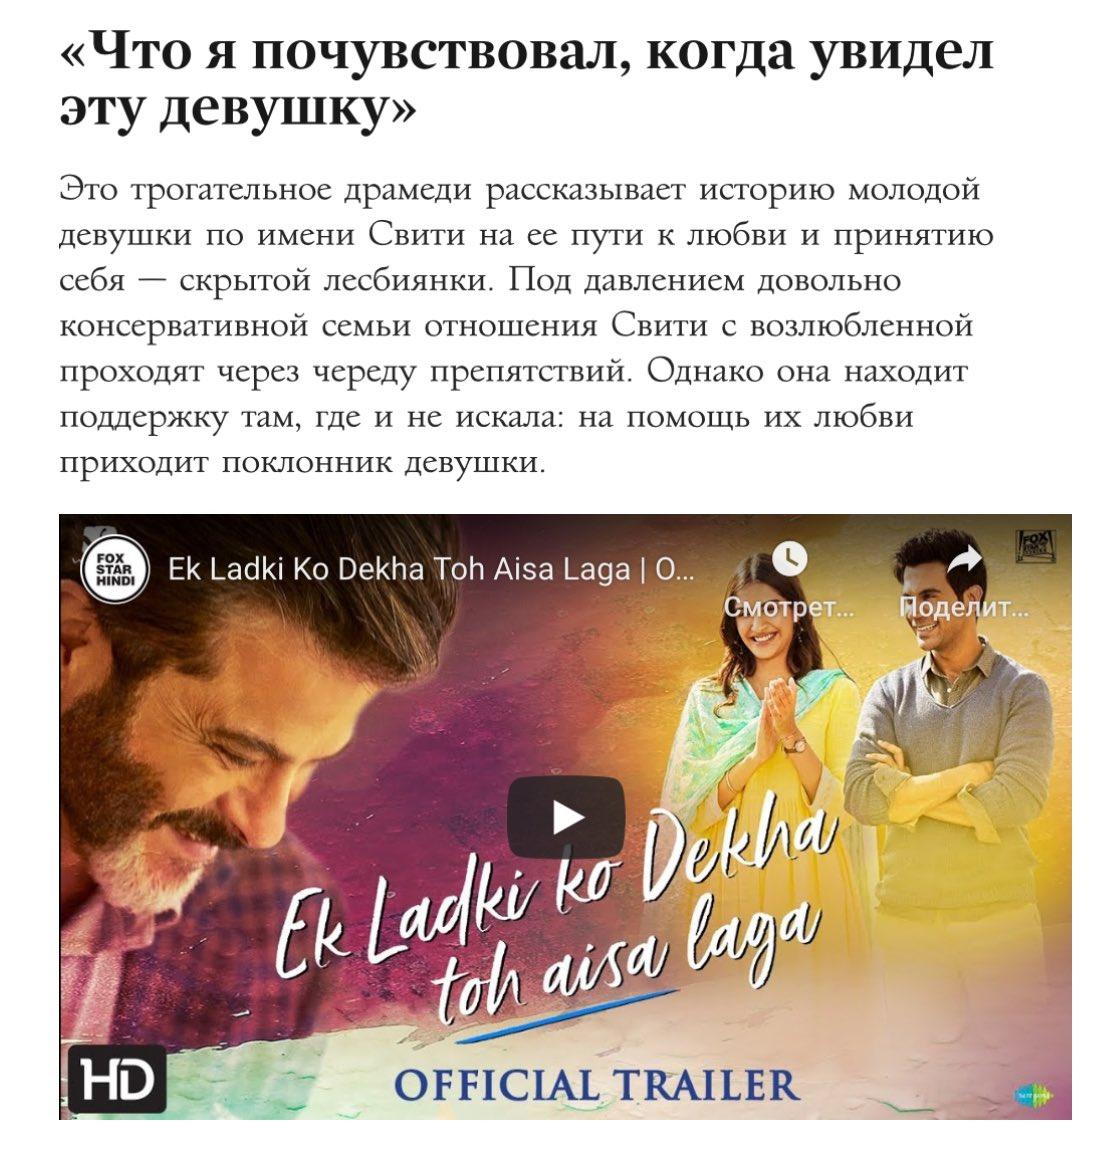 Esquire Russia included «Ek Ladki Ko Dekha Toh Aisa Laga» in the list of top 10 Bollywood films. –   @sonamakapoor @AnilKapoor @RajkummarRao @iam_juhi @ShellyCDhar